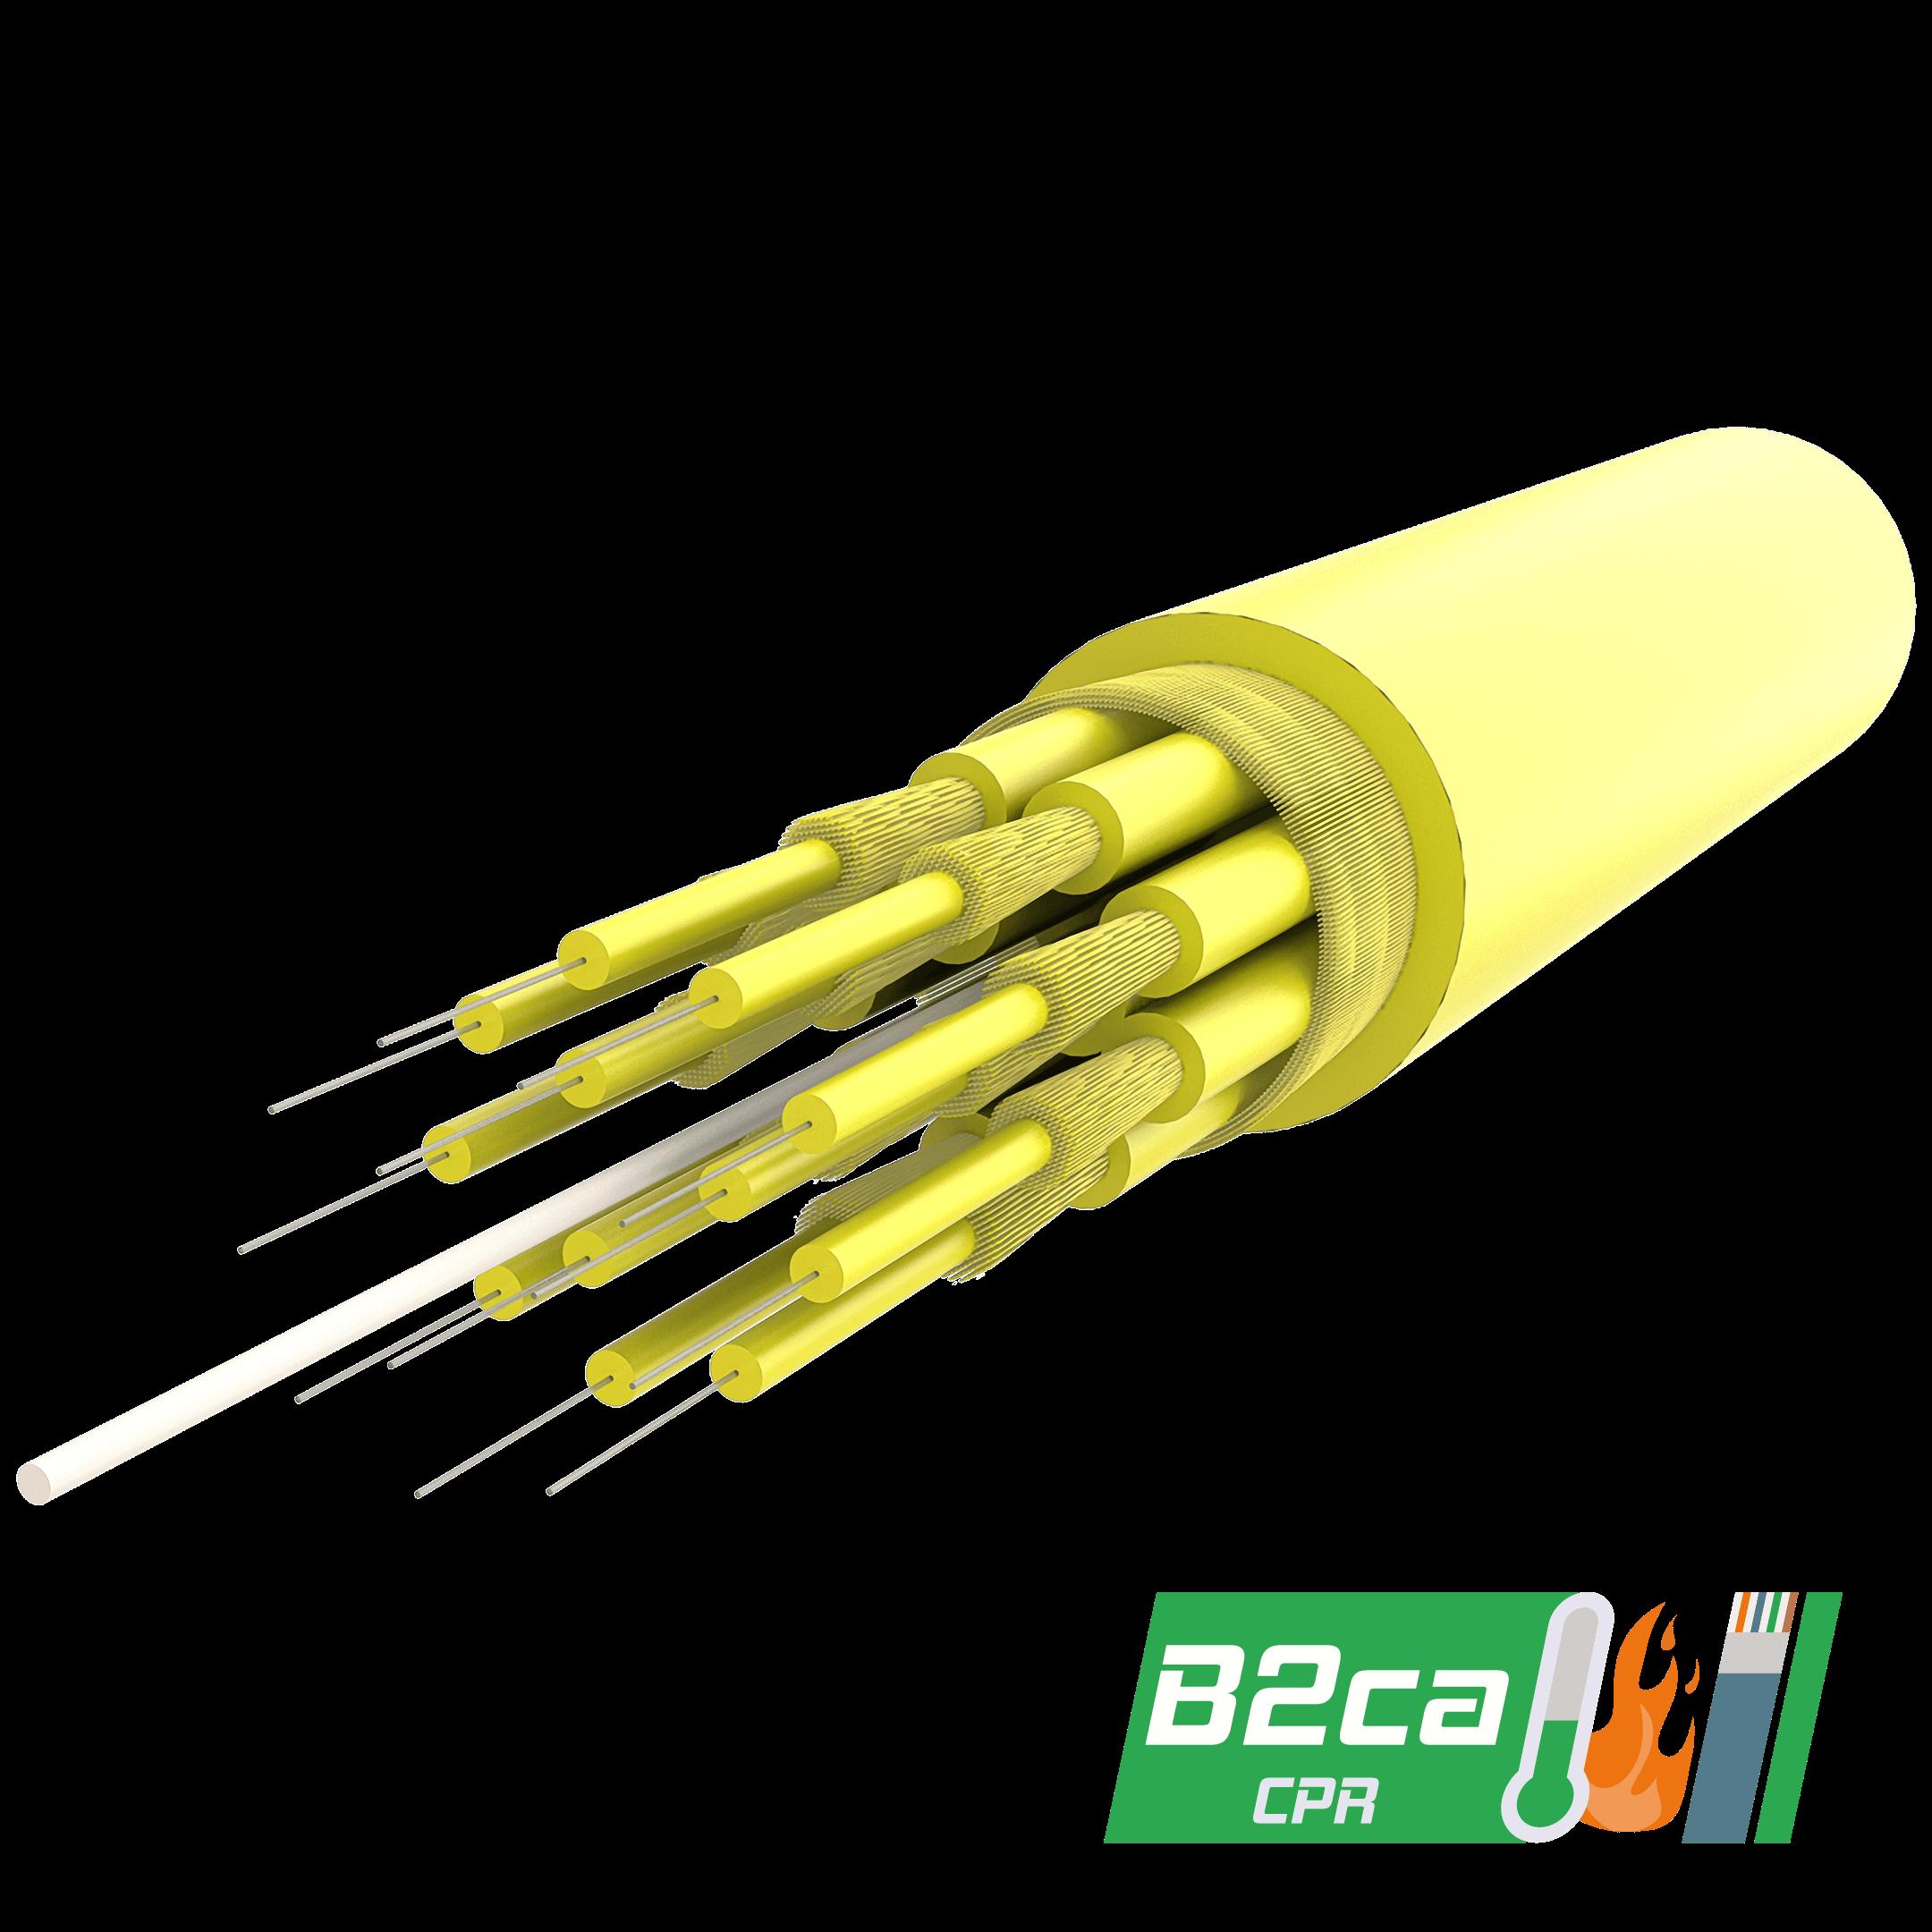 Samm Teknoloji - Breakout Fiber Optik Kablo | up to 24 Fiber